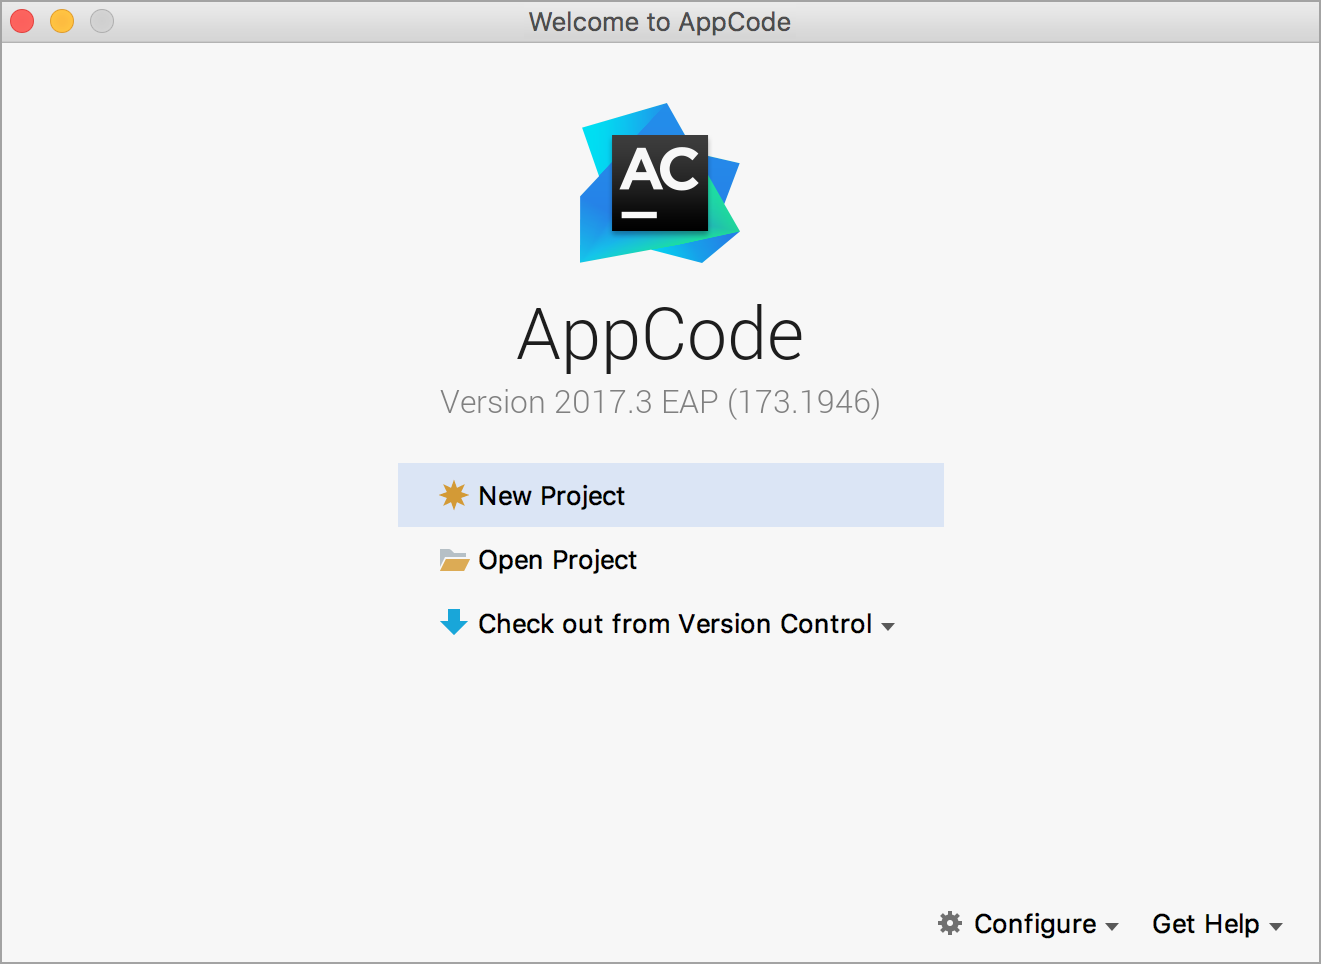 ac welcomeScreen